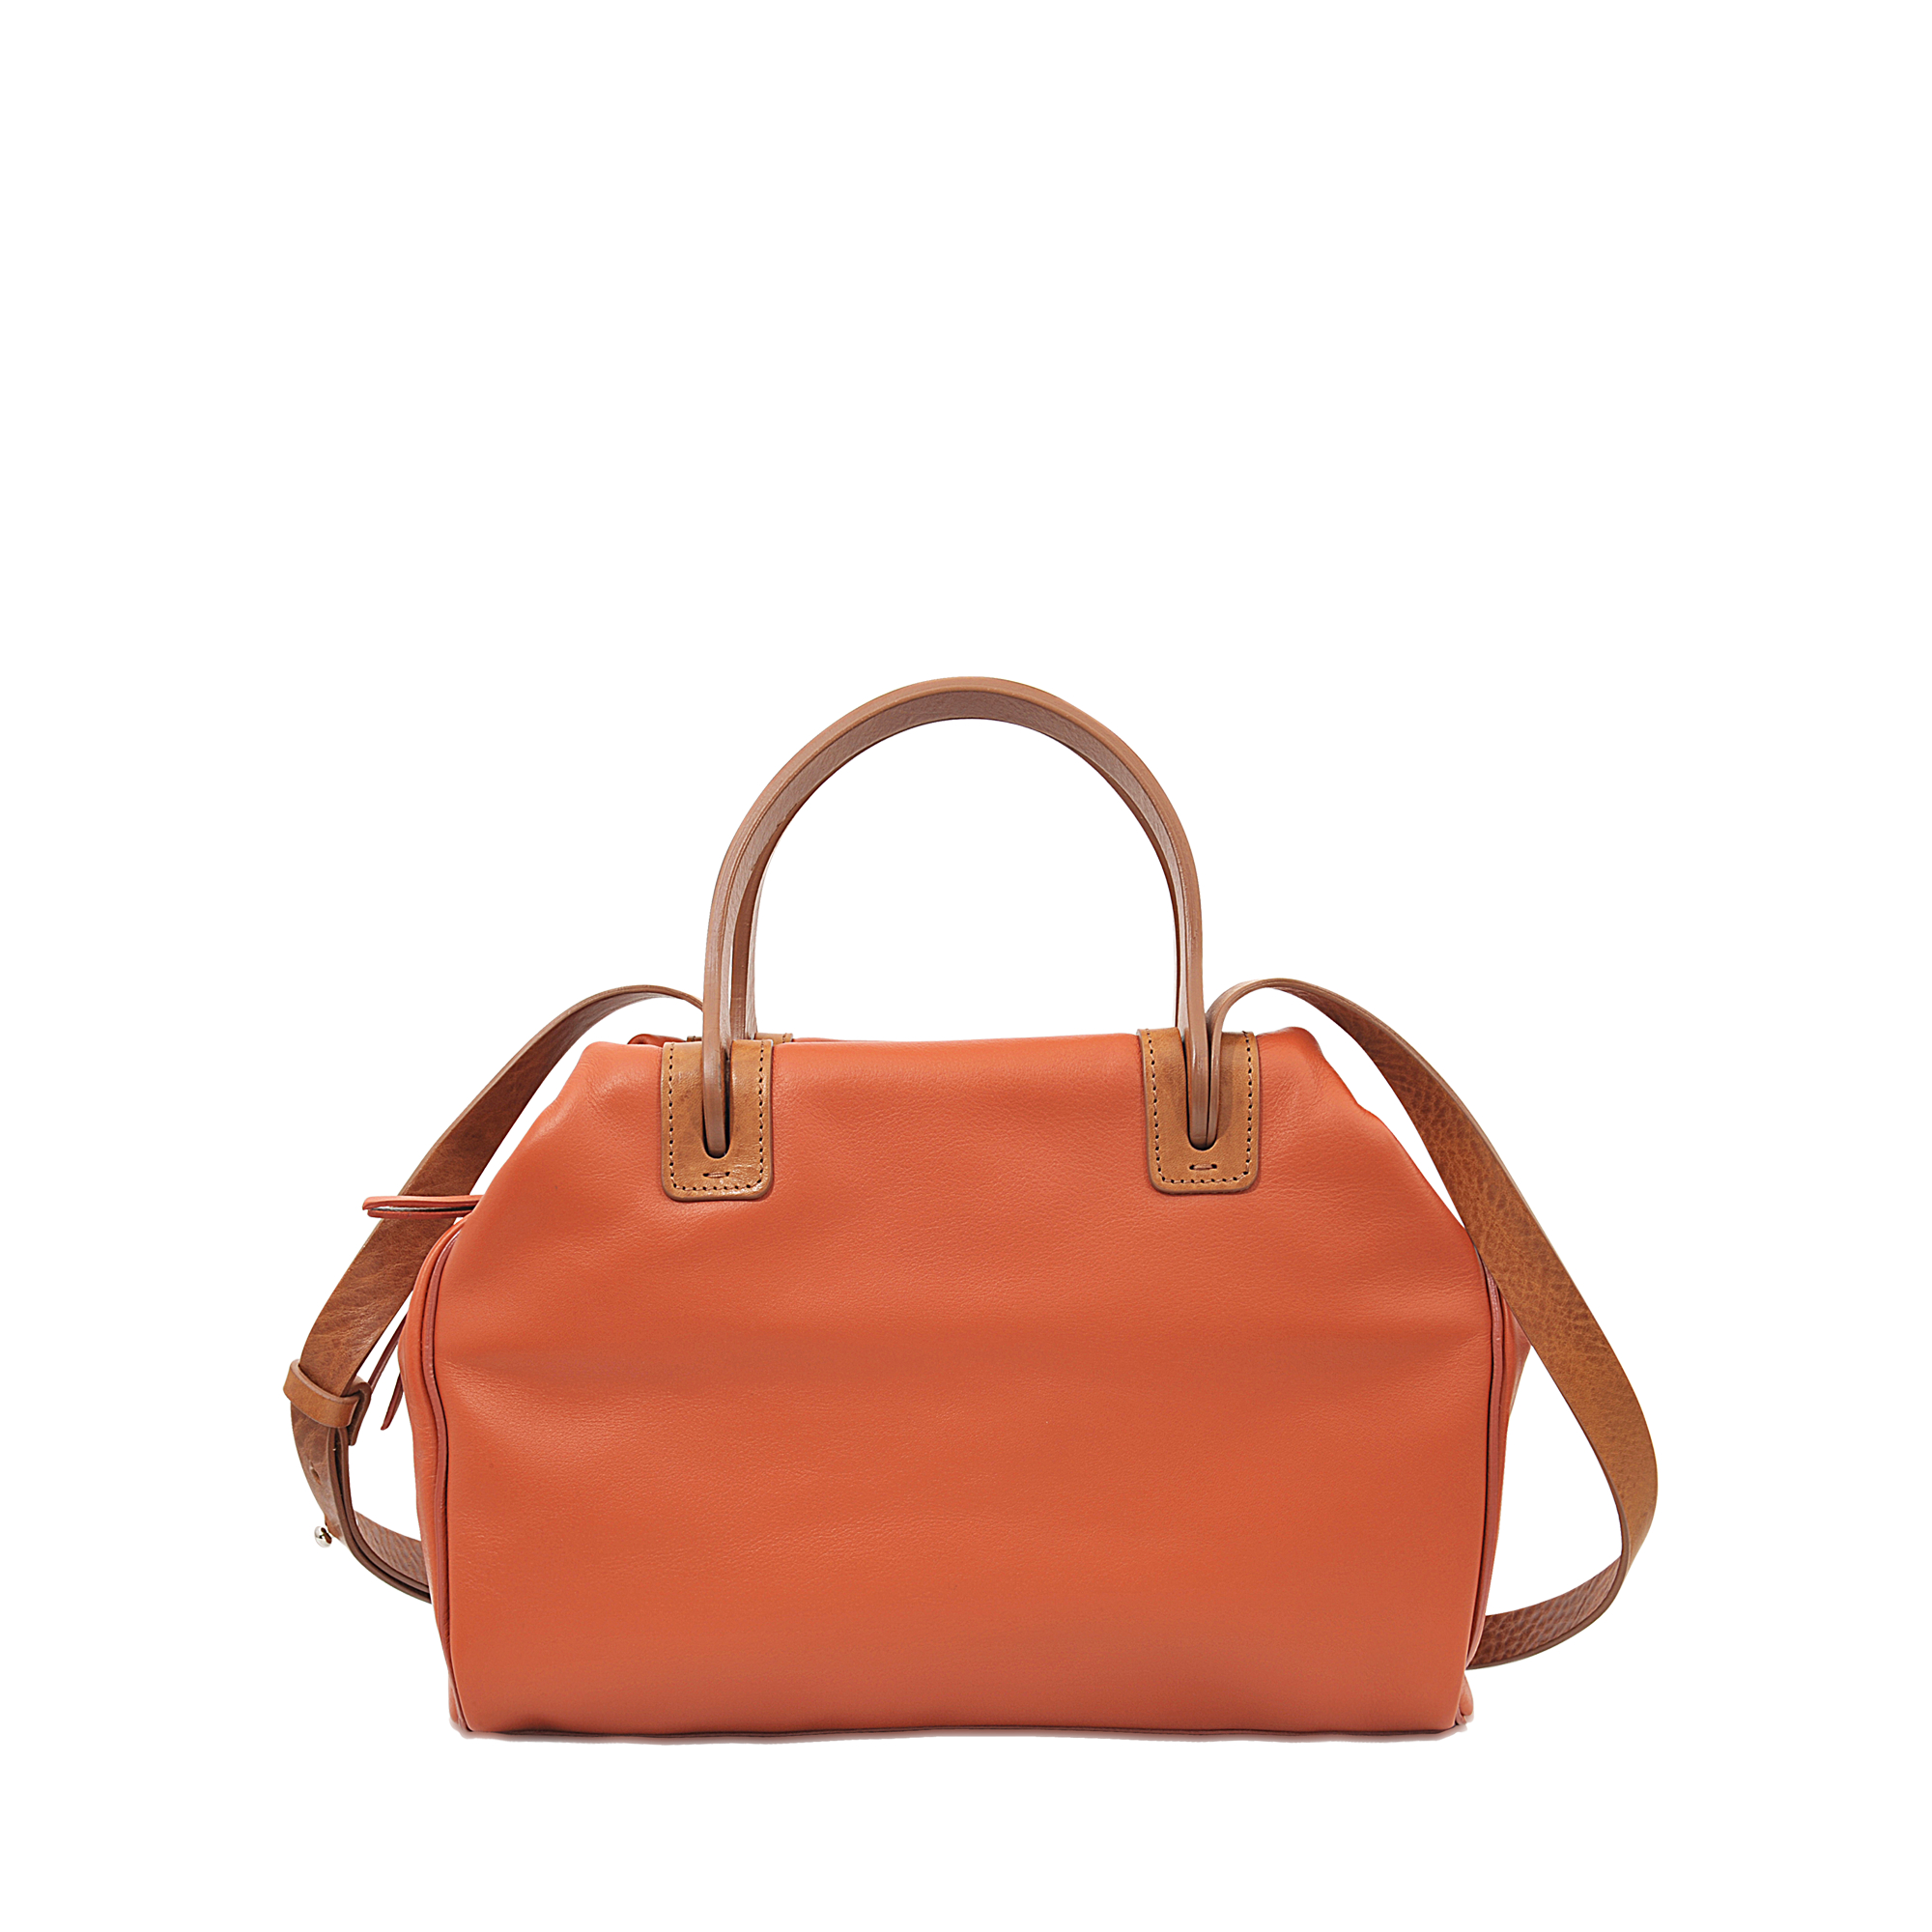 Maison margiela Pick Up Bowling Bag in Orange